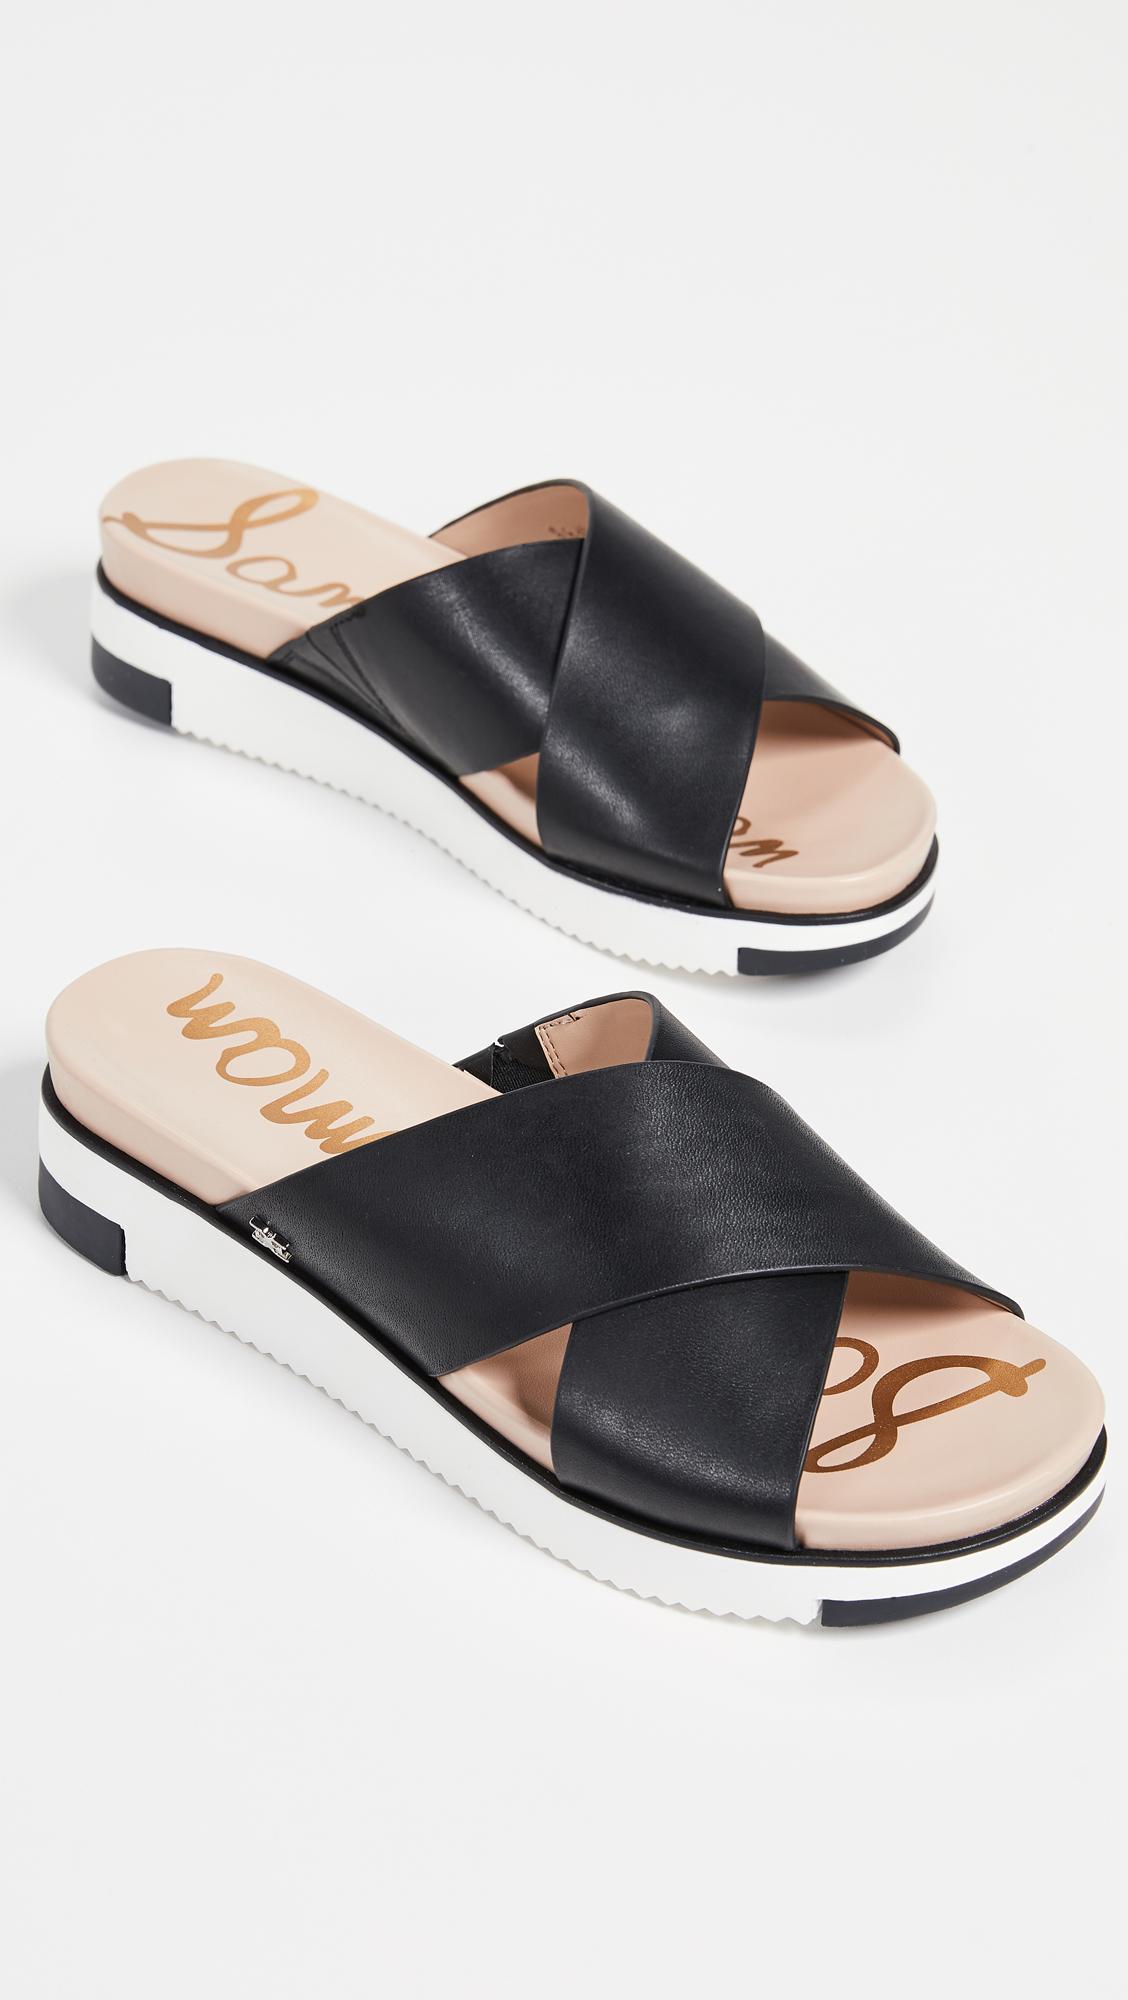 6933b8fd5 Sam Edelman Audrea Slide Sandals